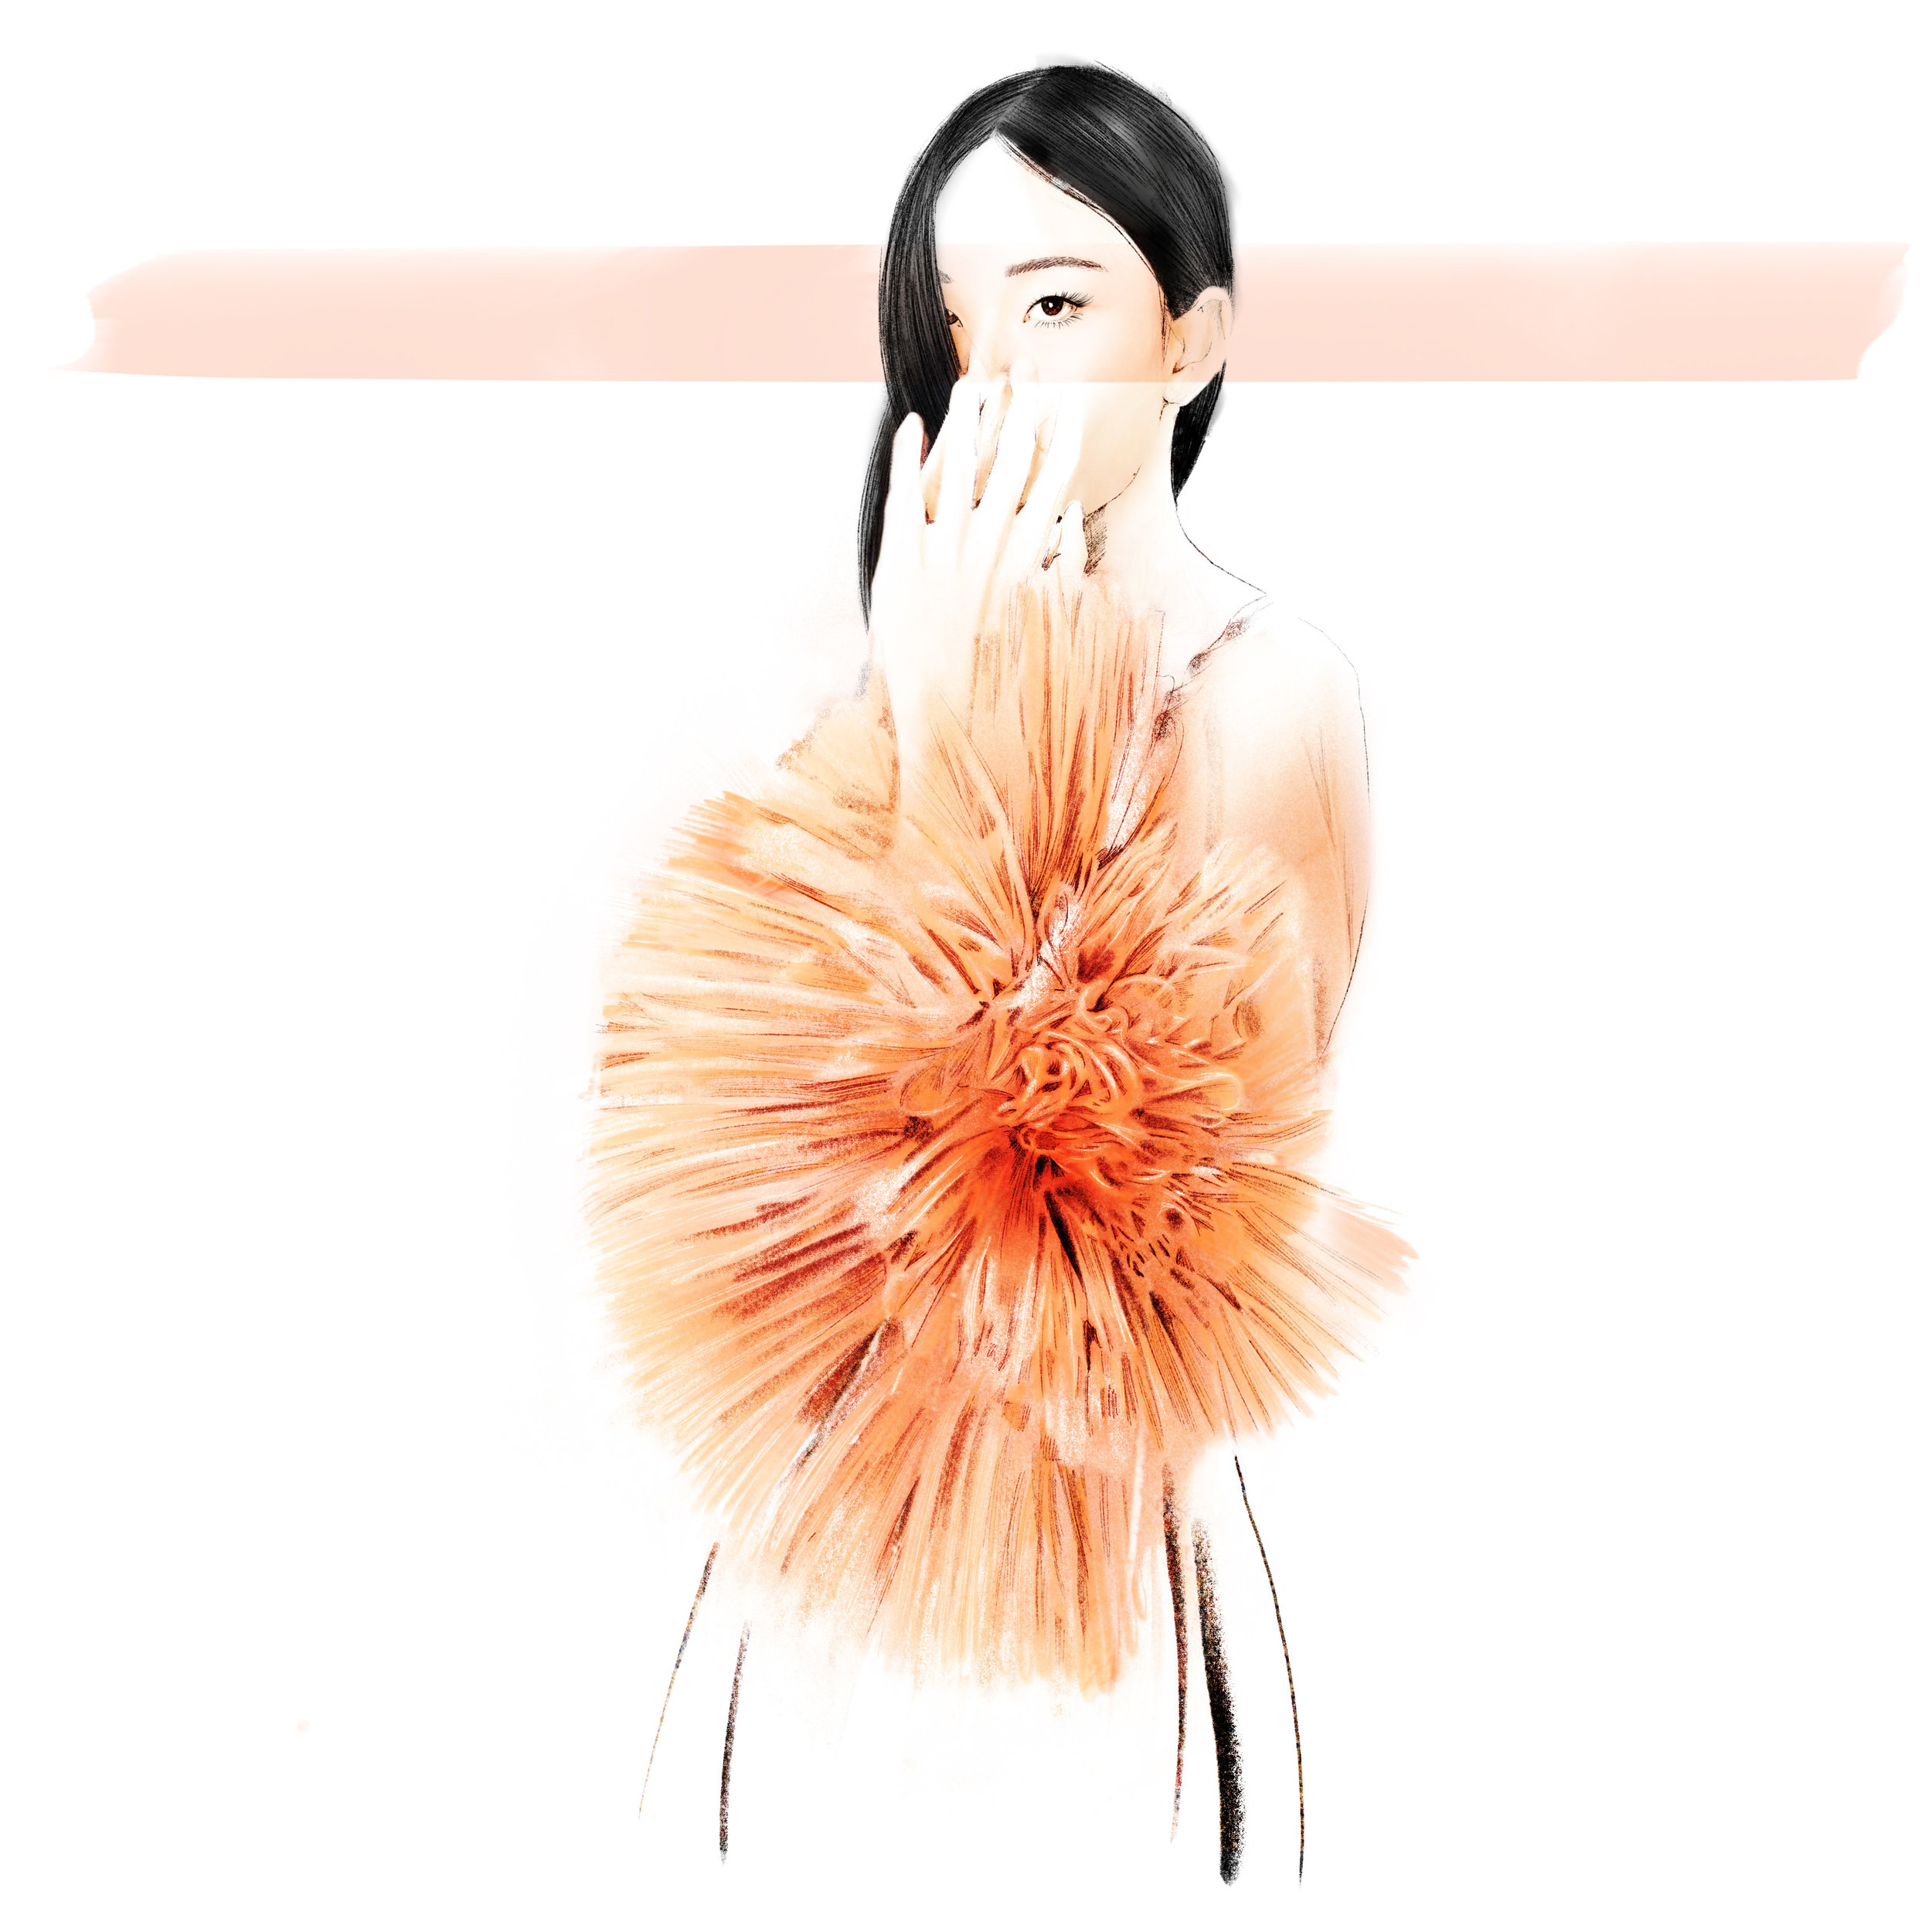 Fashion illustrator Hong Kong